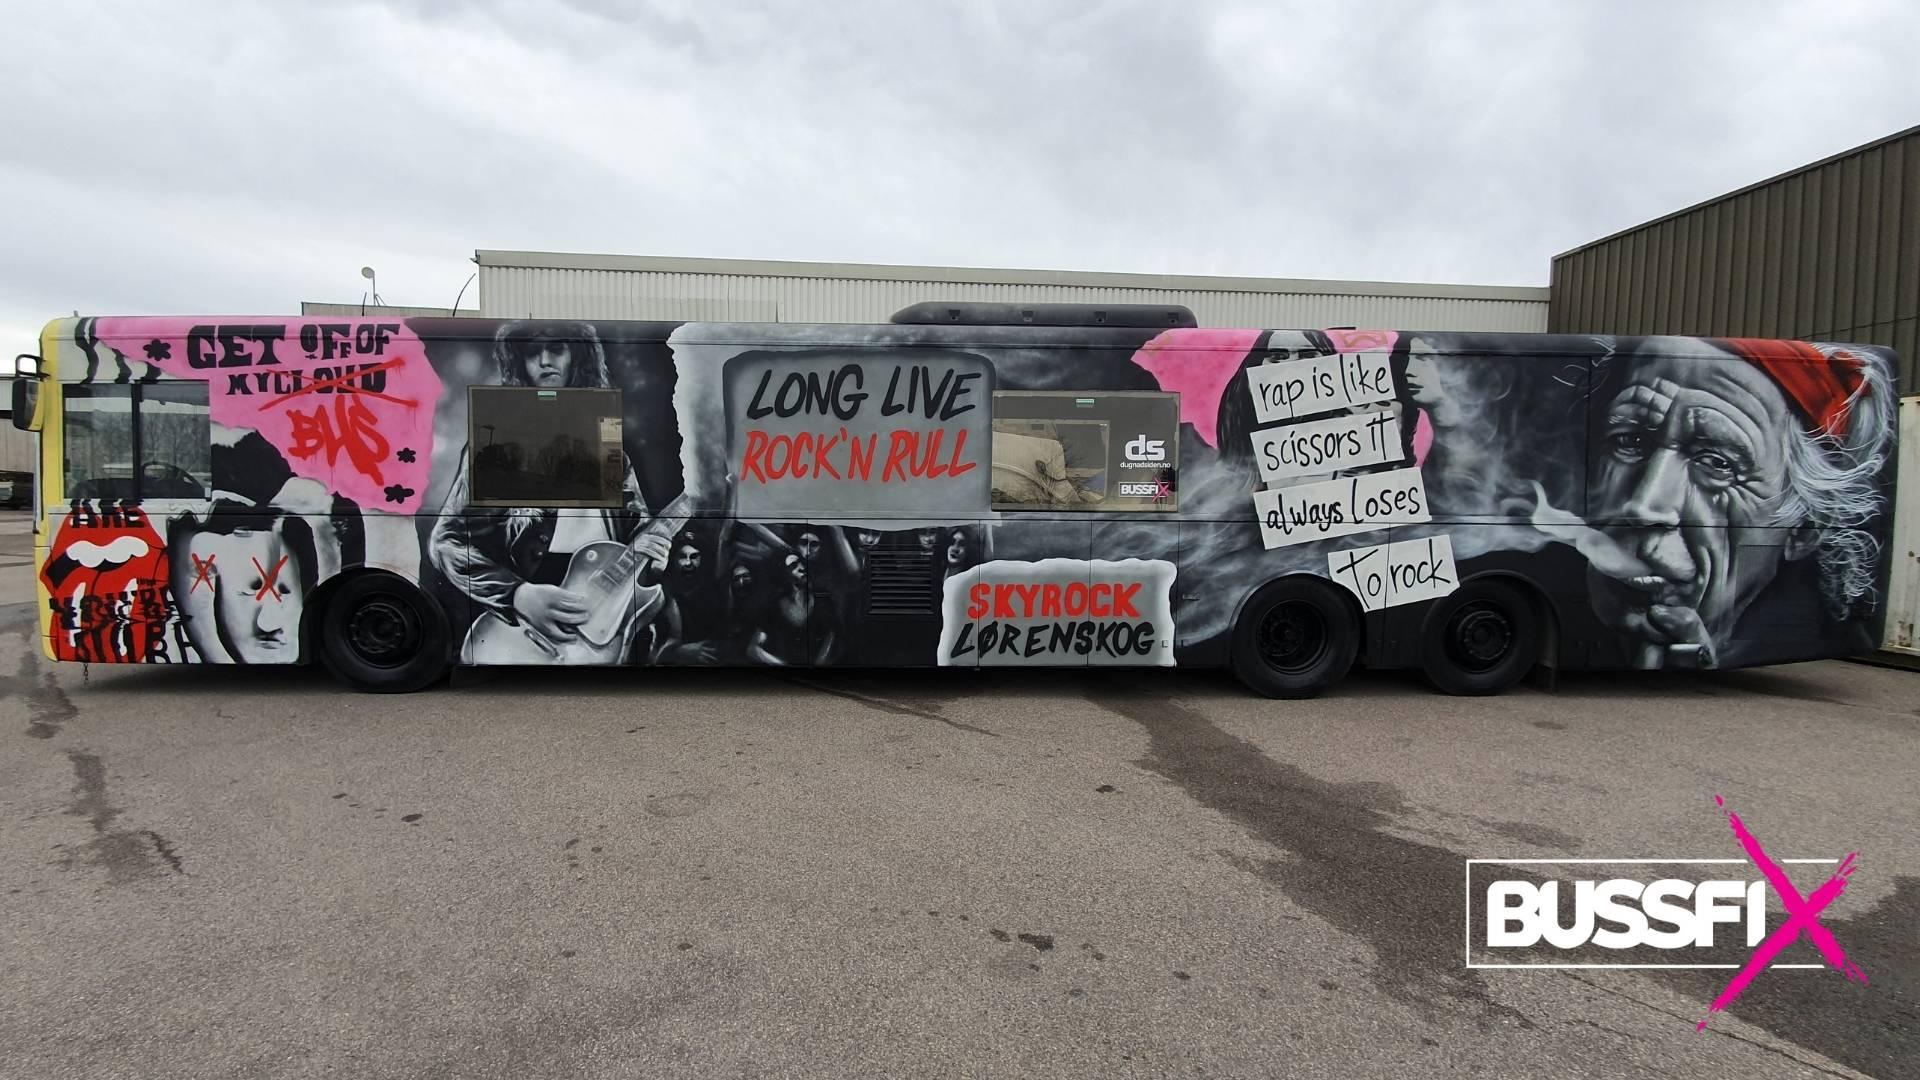 Graffiti russebuss Skyrock 2020